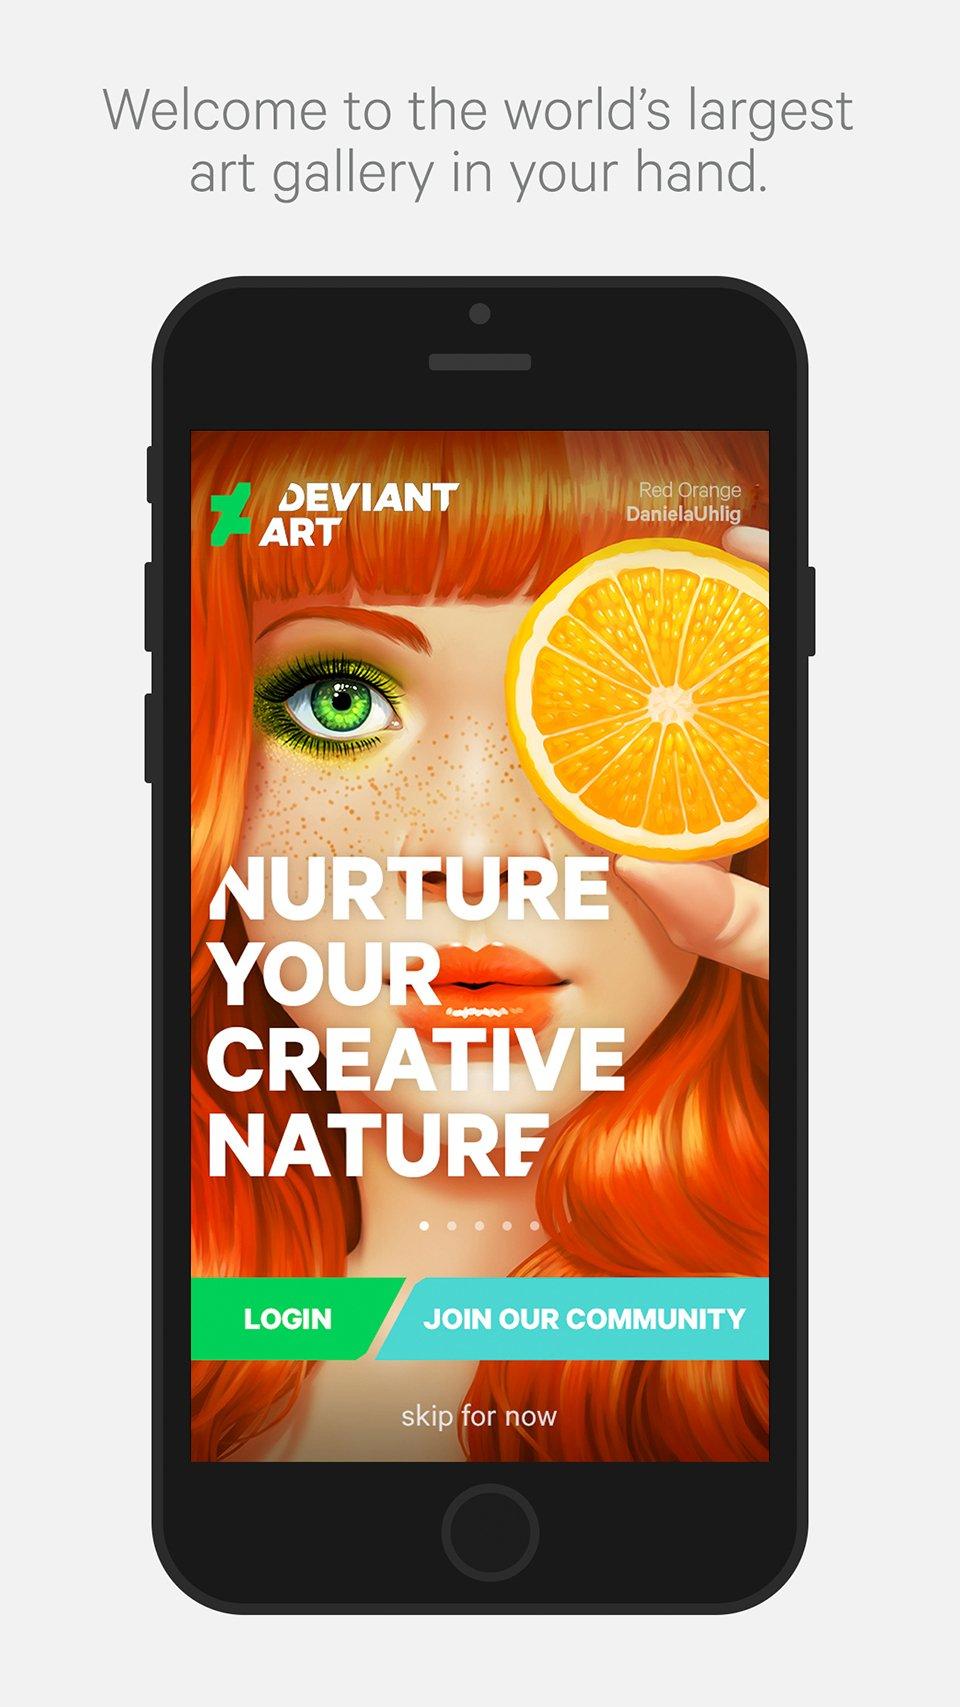 DeviantArt Official Mobile App